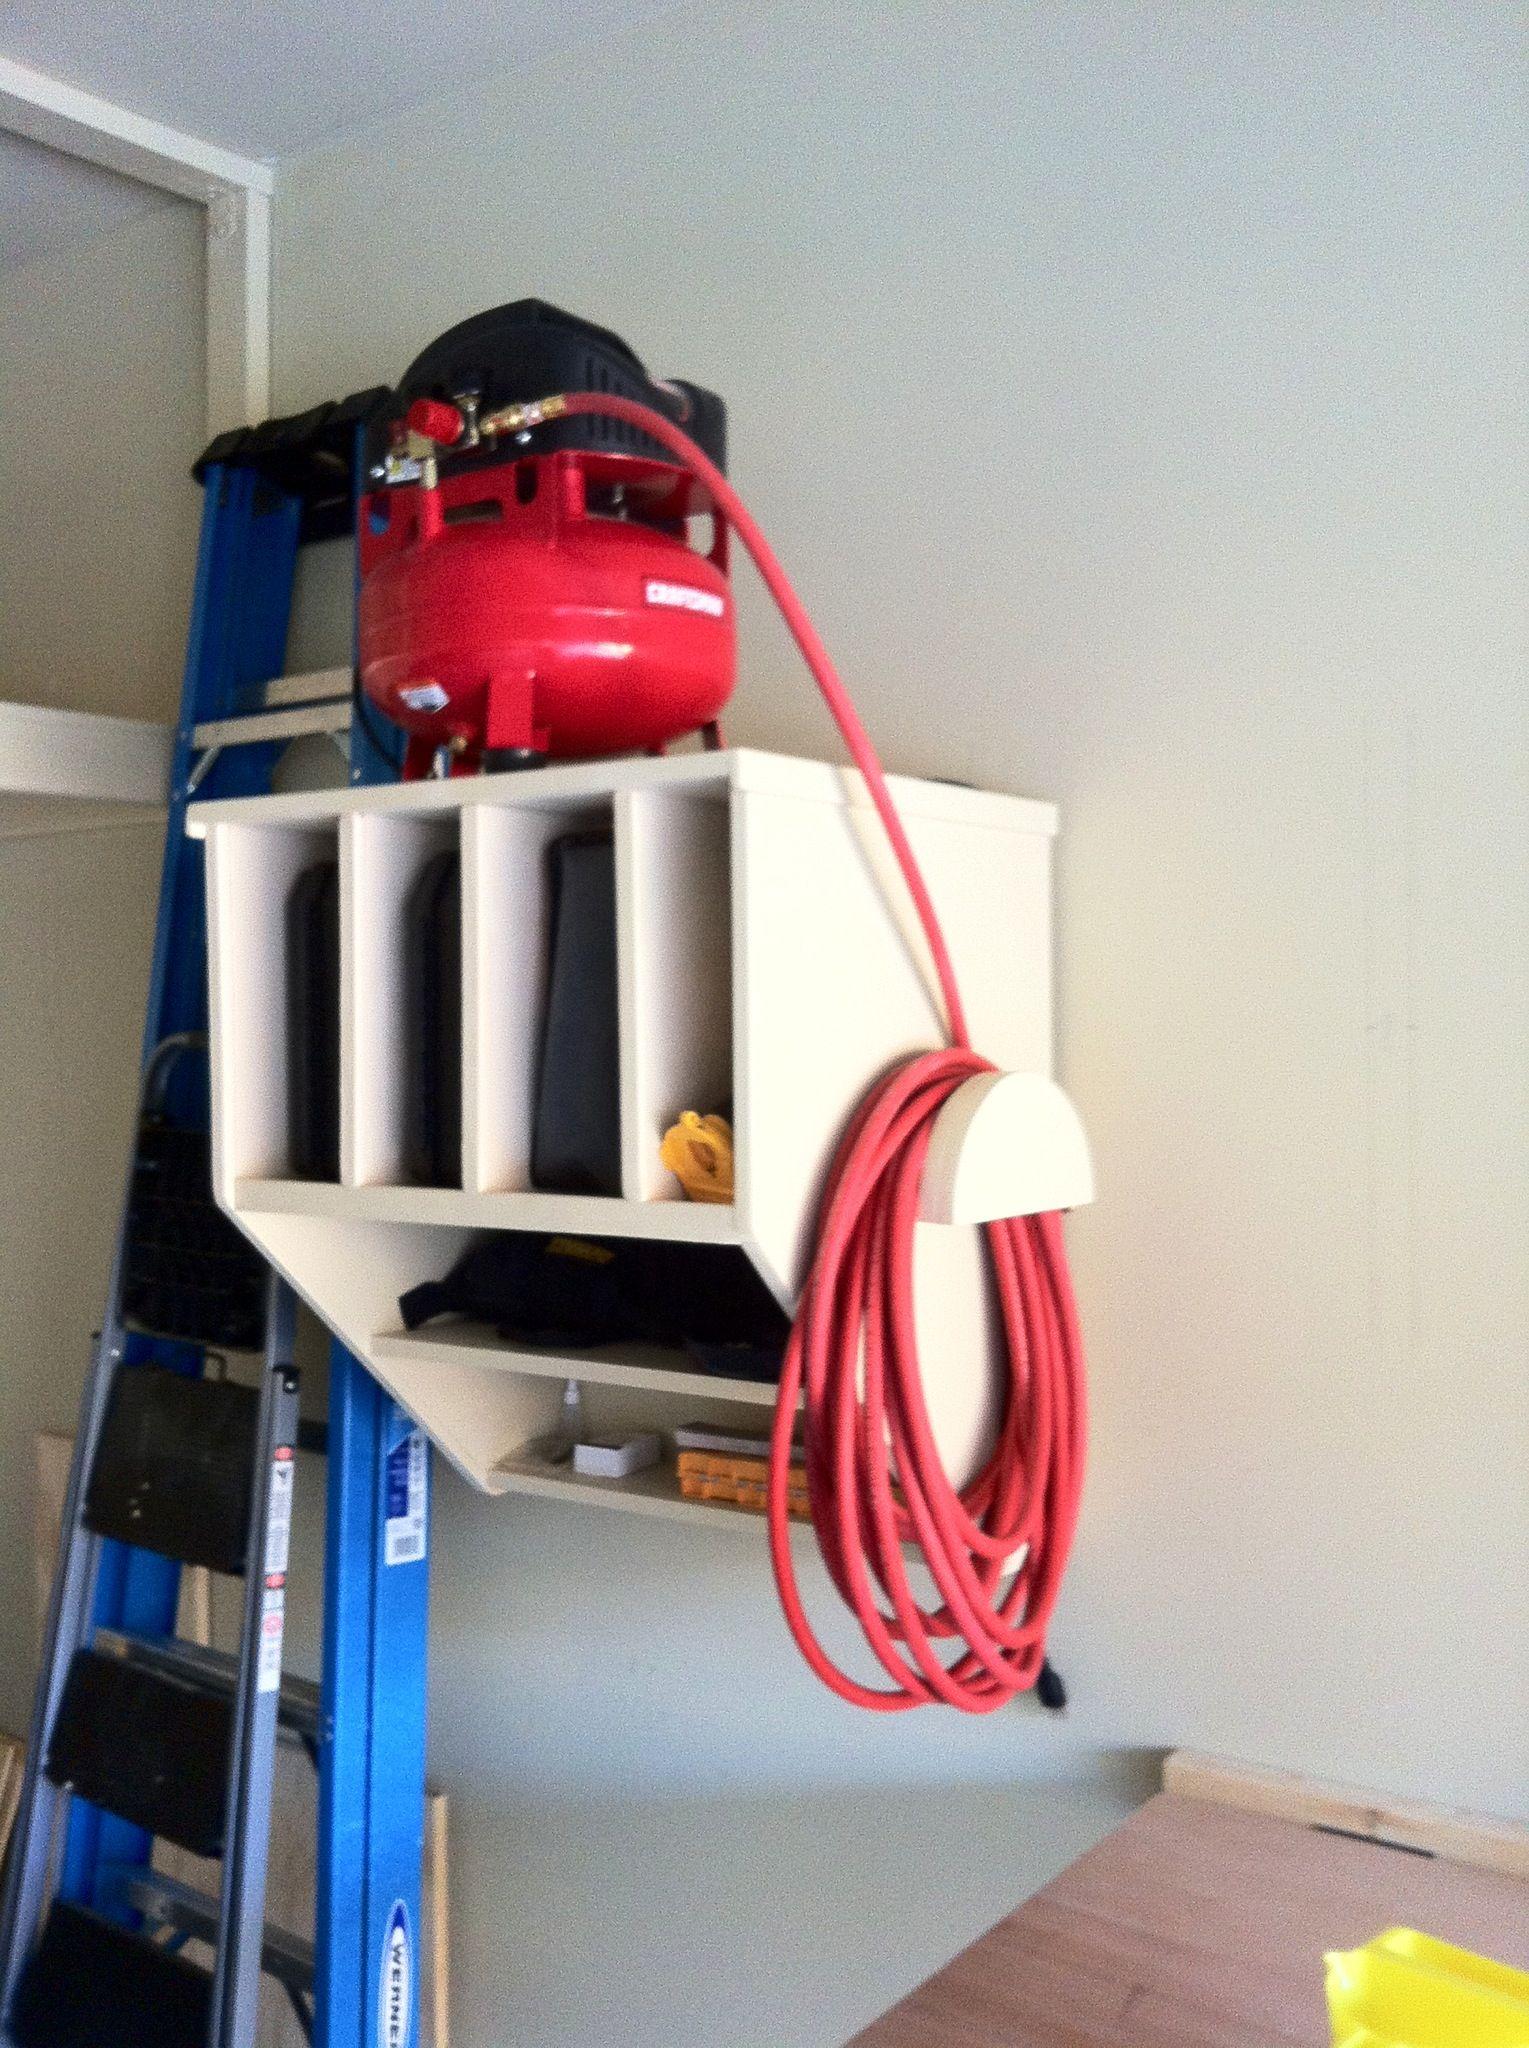 Air compressor shelf. Via Reader's Digest. Garage